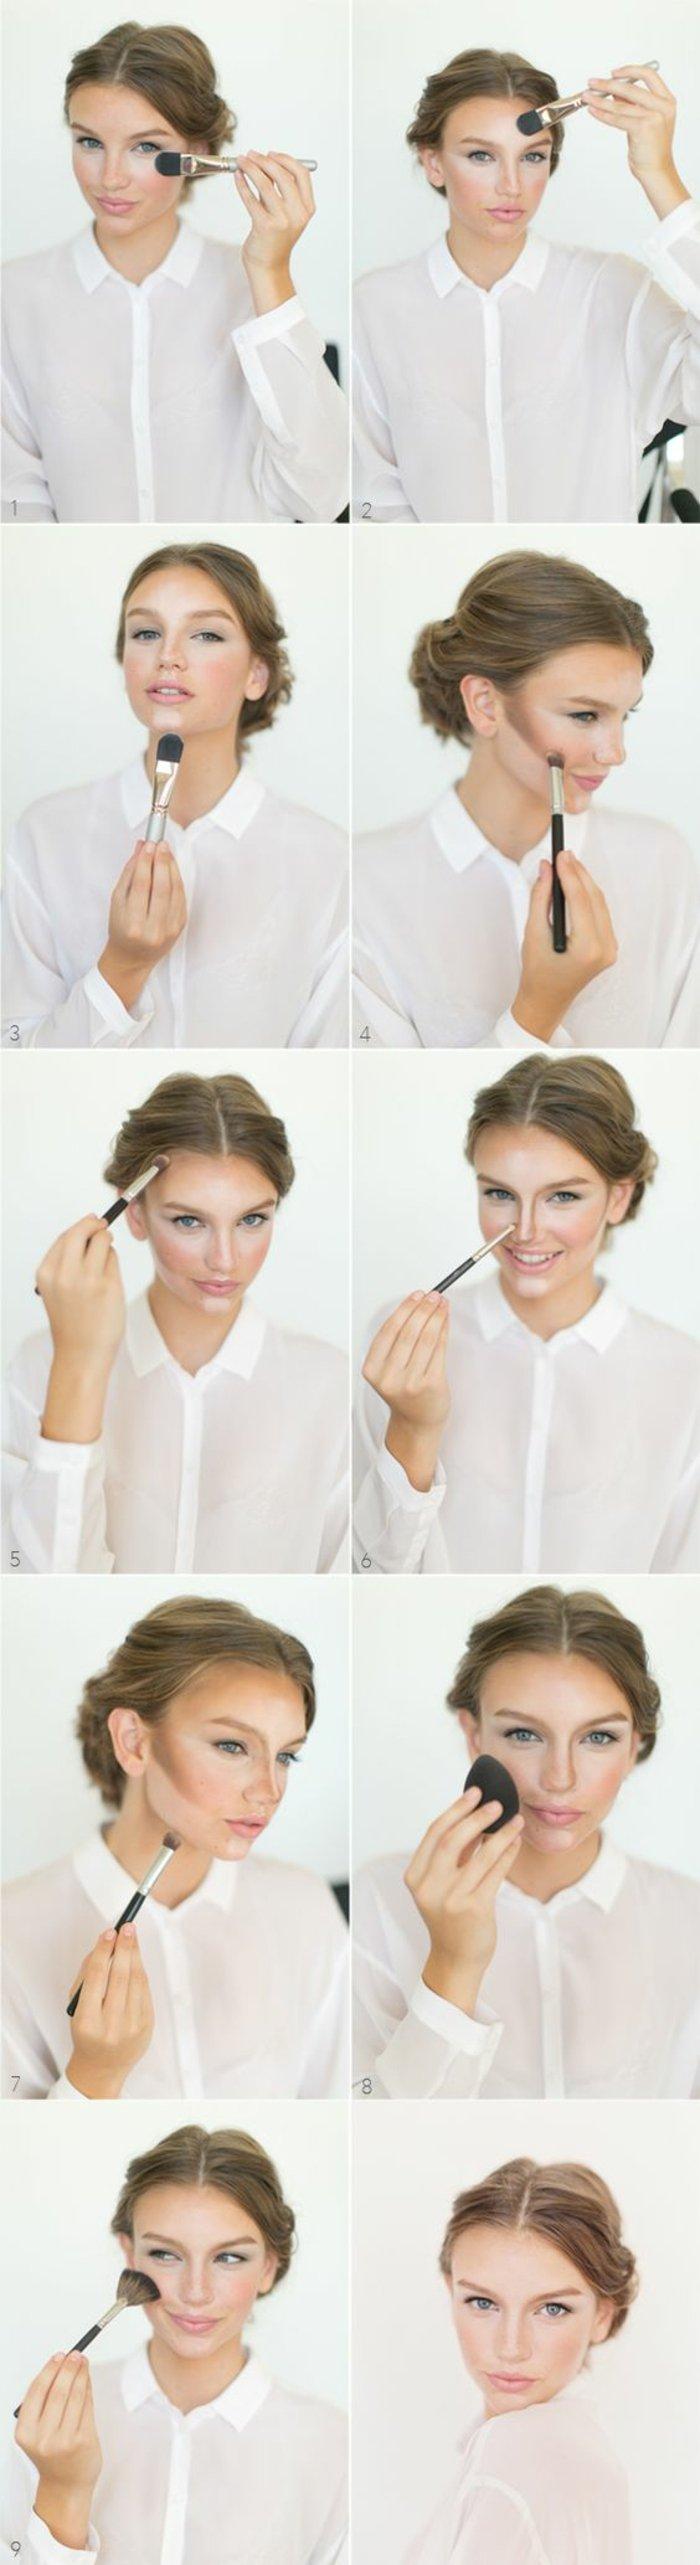 0-maquillage-discret-apprendre-a-se-maquiller-facilement-nos-idees-en-photos